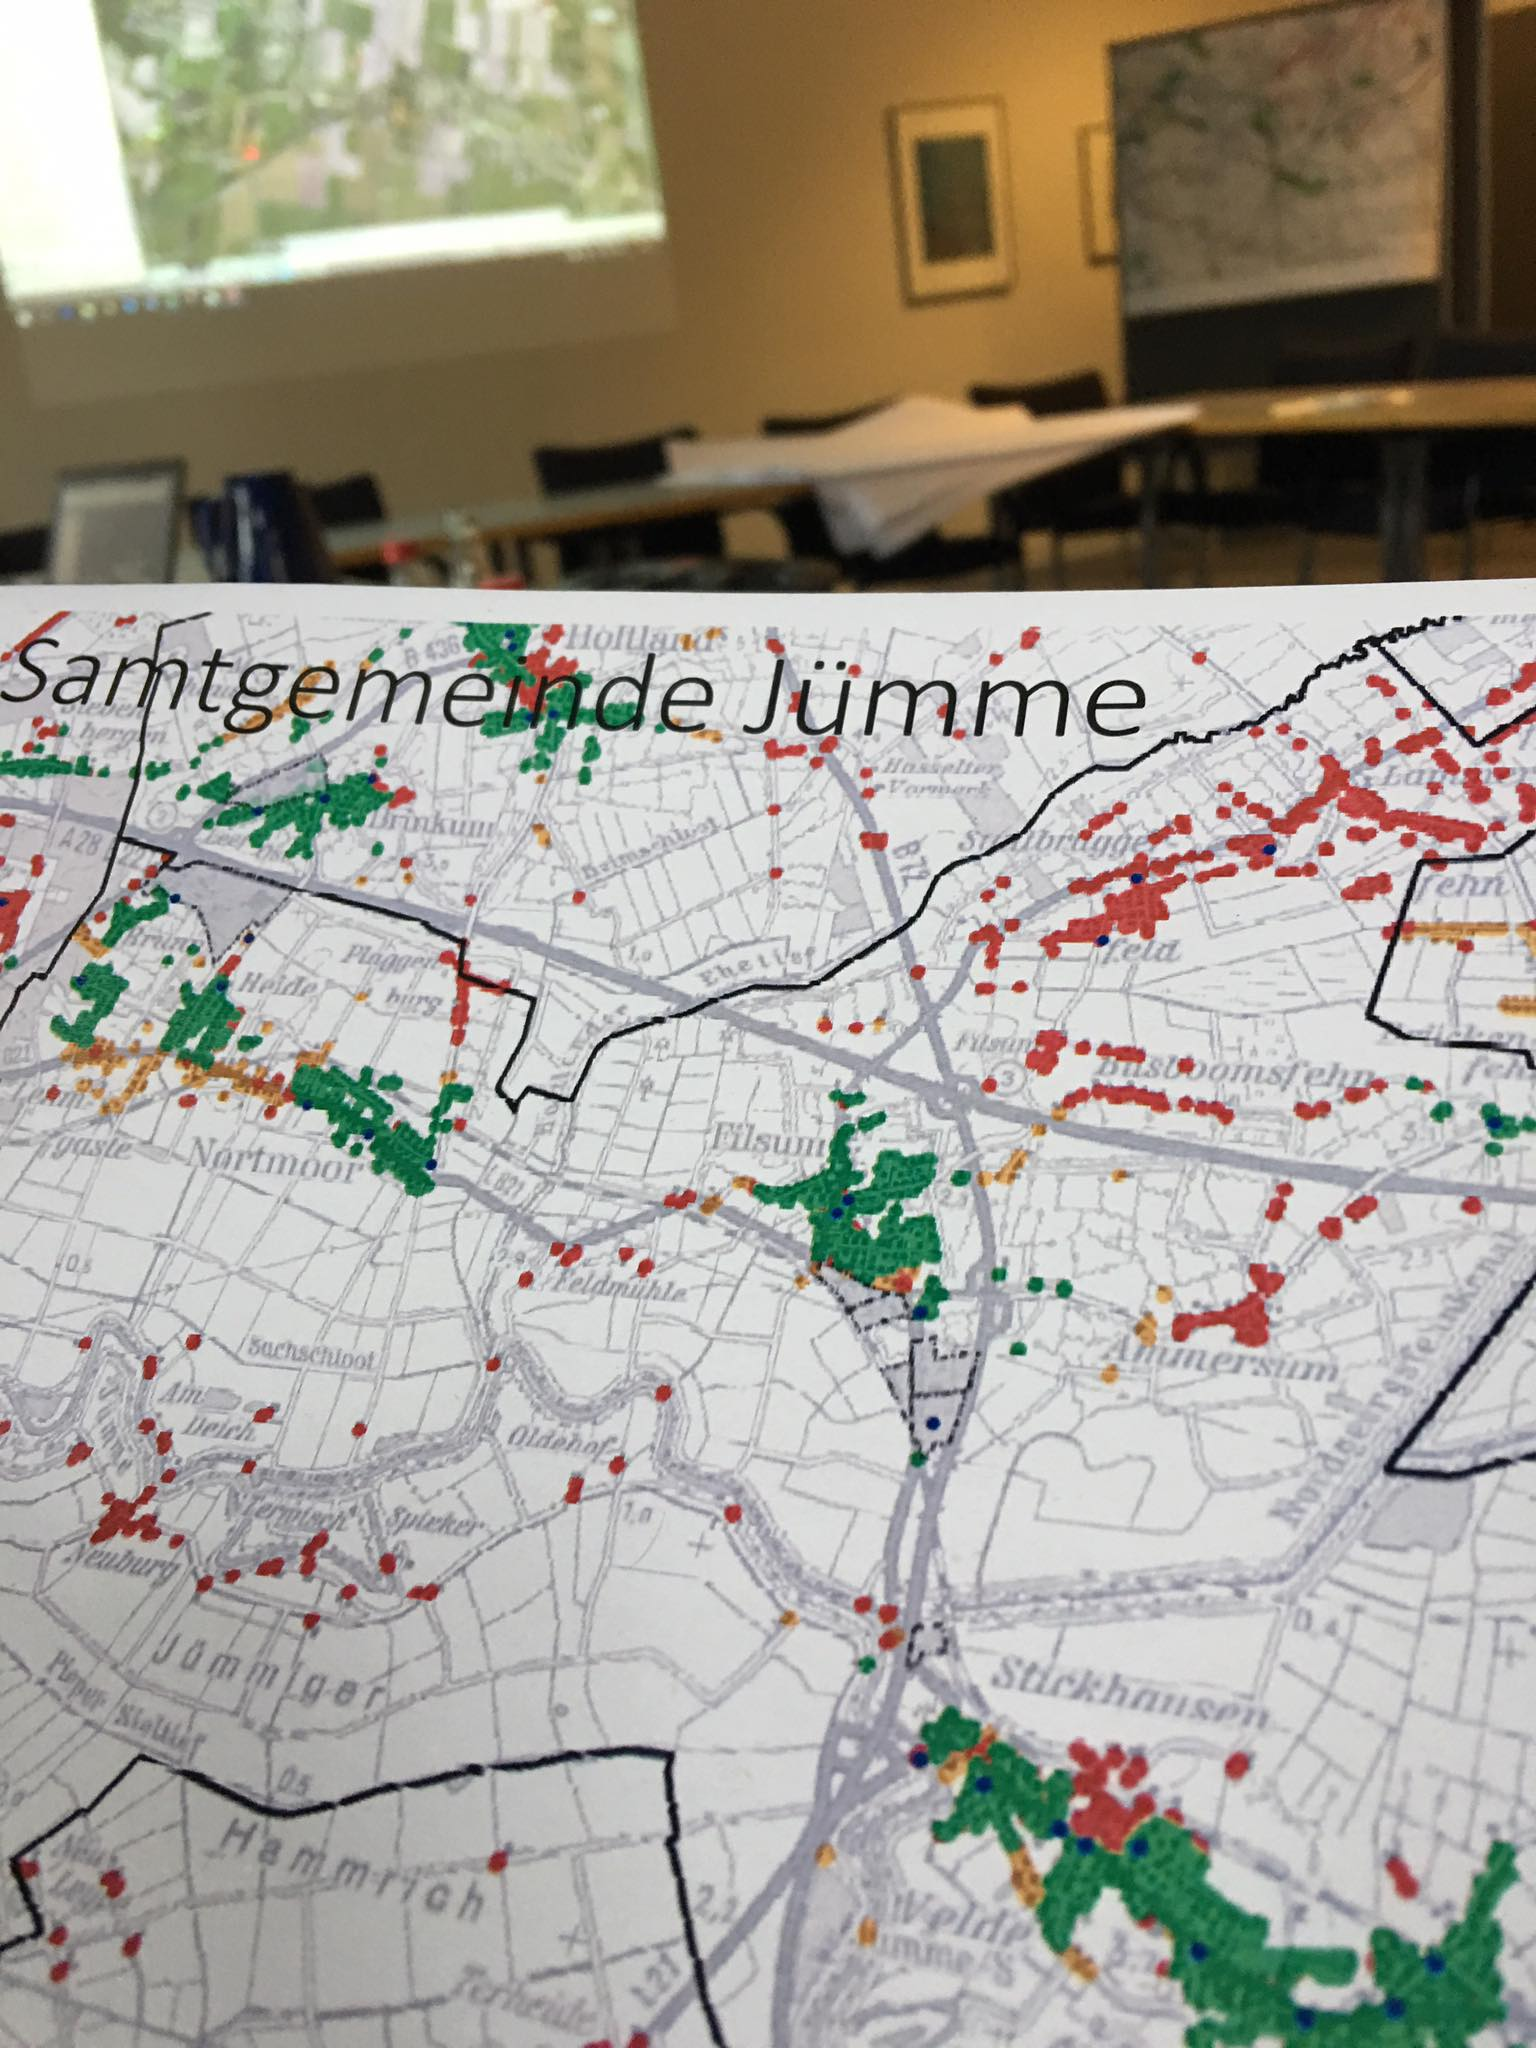 Breitbandversorgung in Jümme: Termin mit dem Landkreis Leer